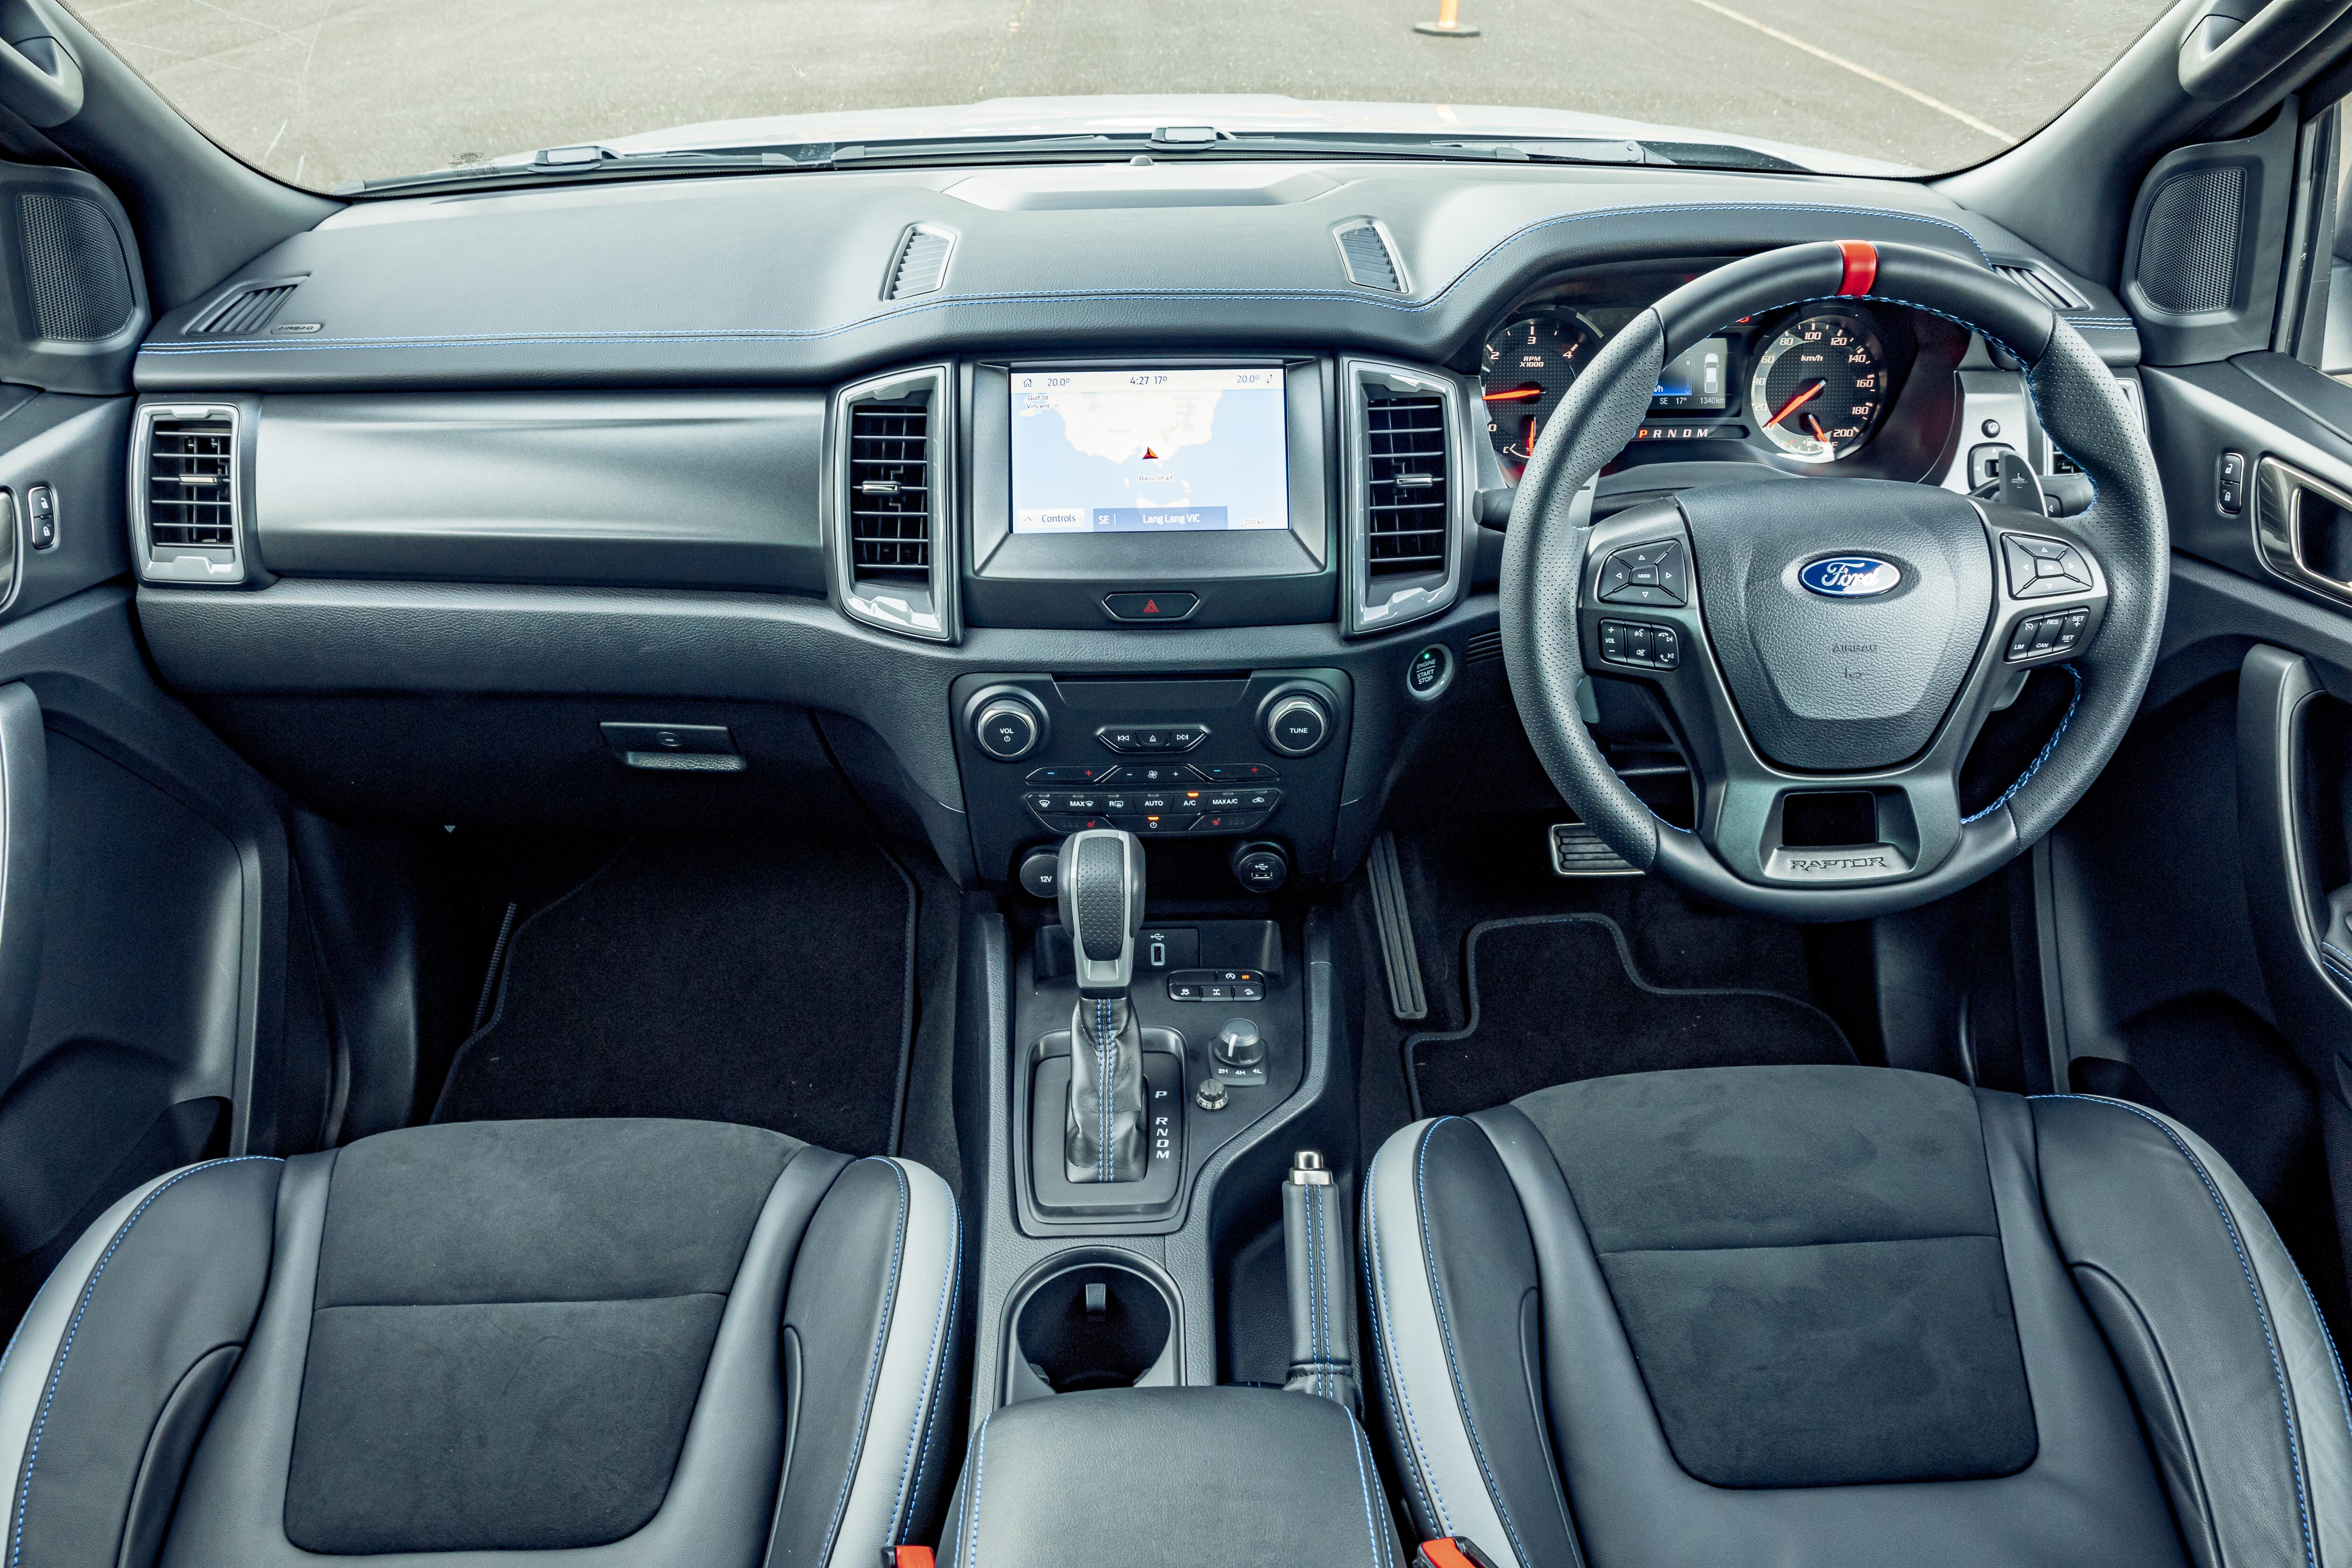 4 X 4 Australia Comparisons 2021 May 21 Ford Ranger Raptor Interior